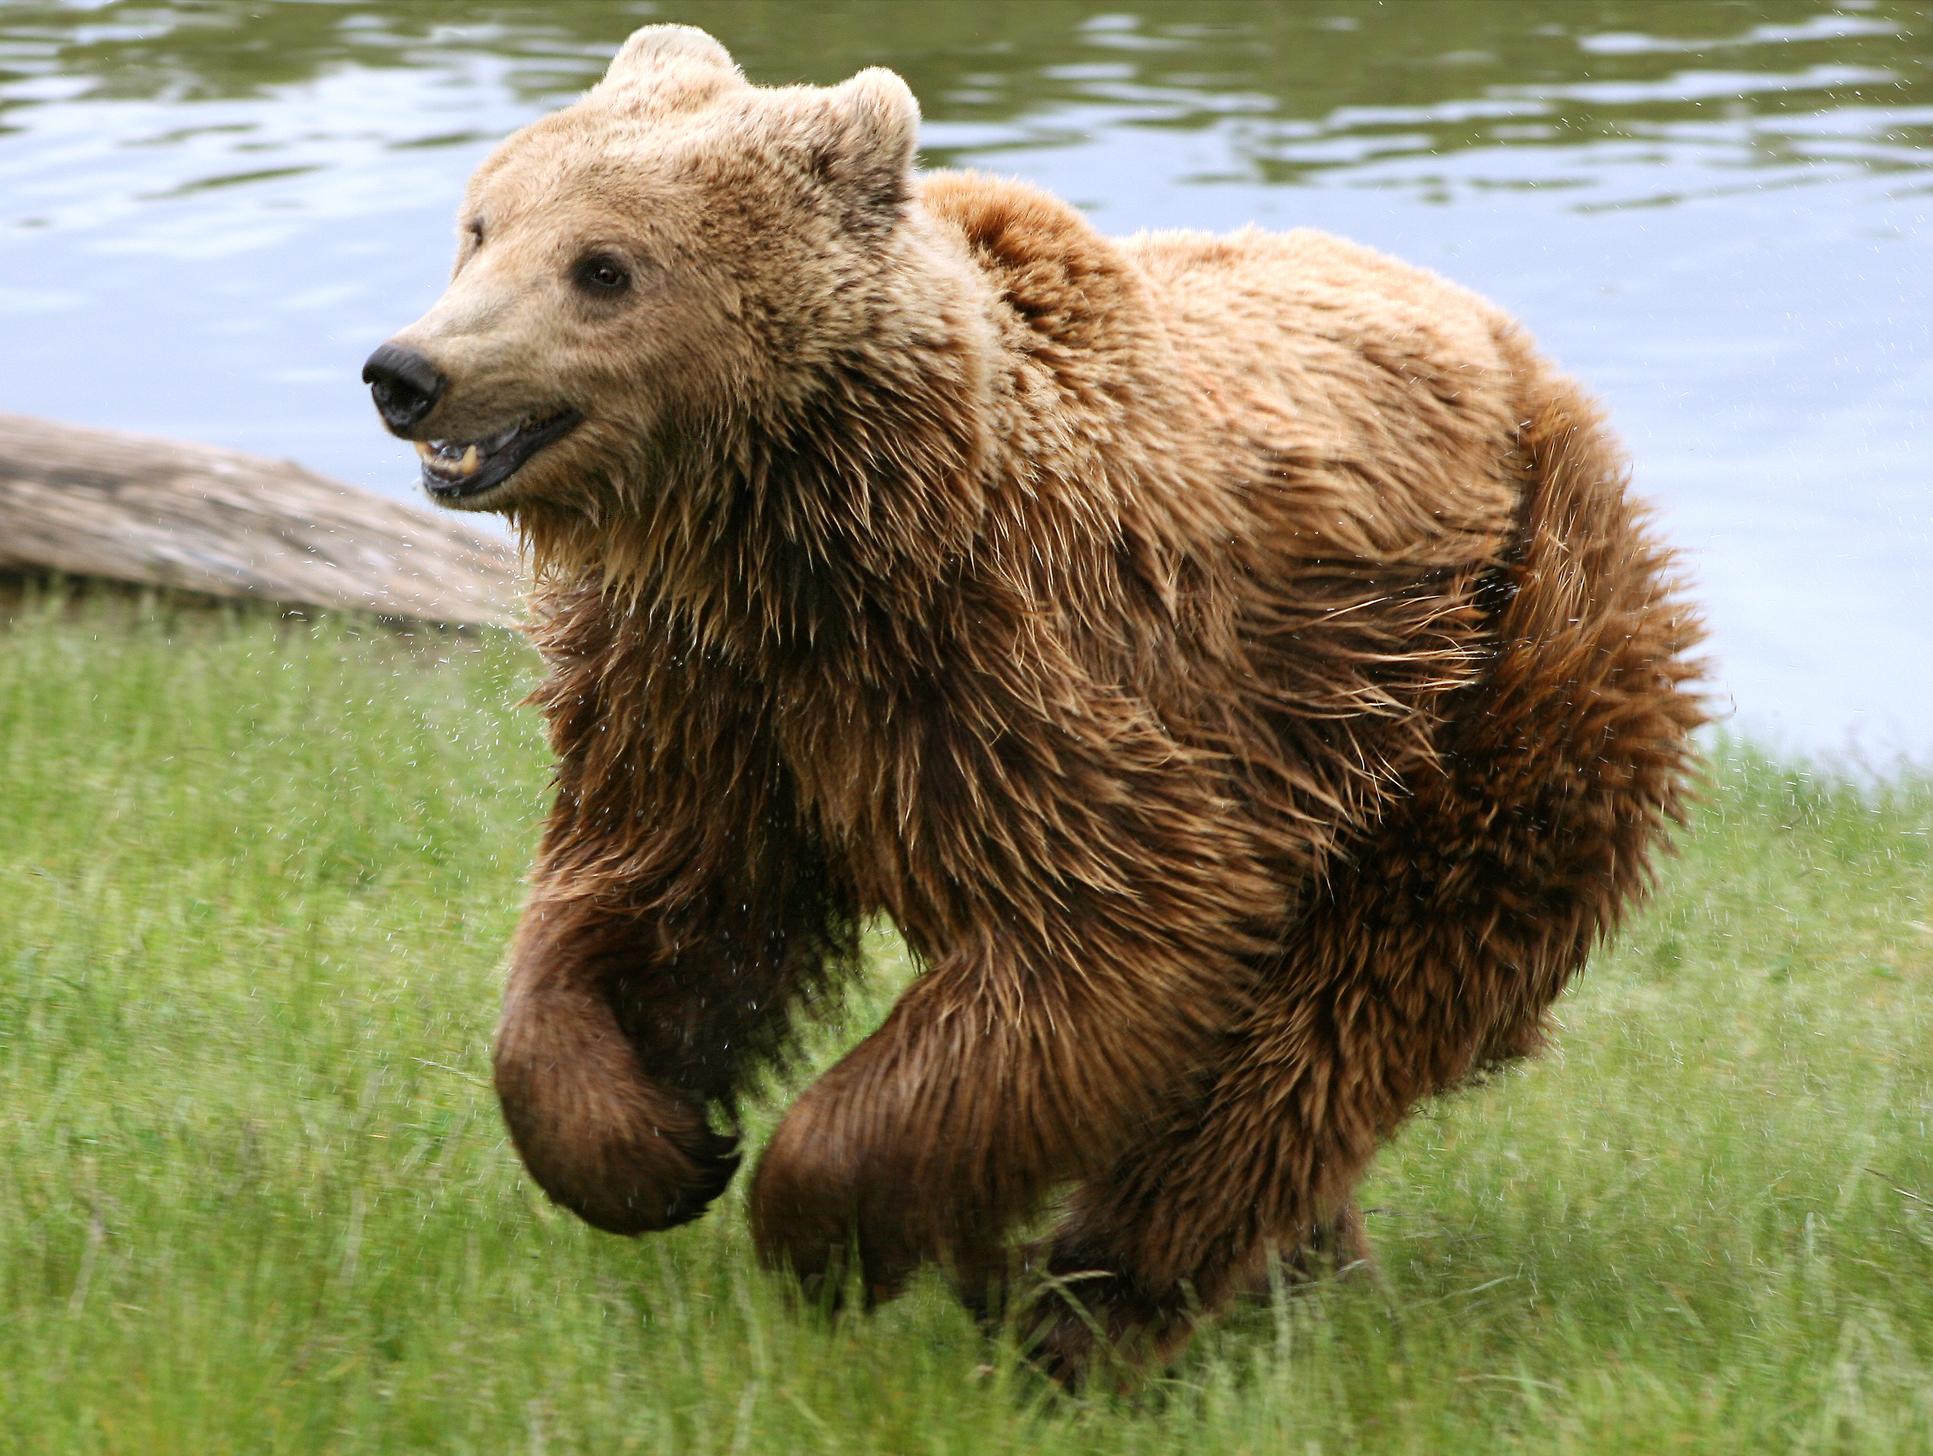 Brown_bear_(Ursus_arctos_arctos)_running